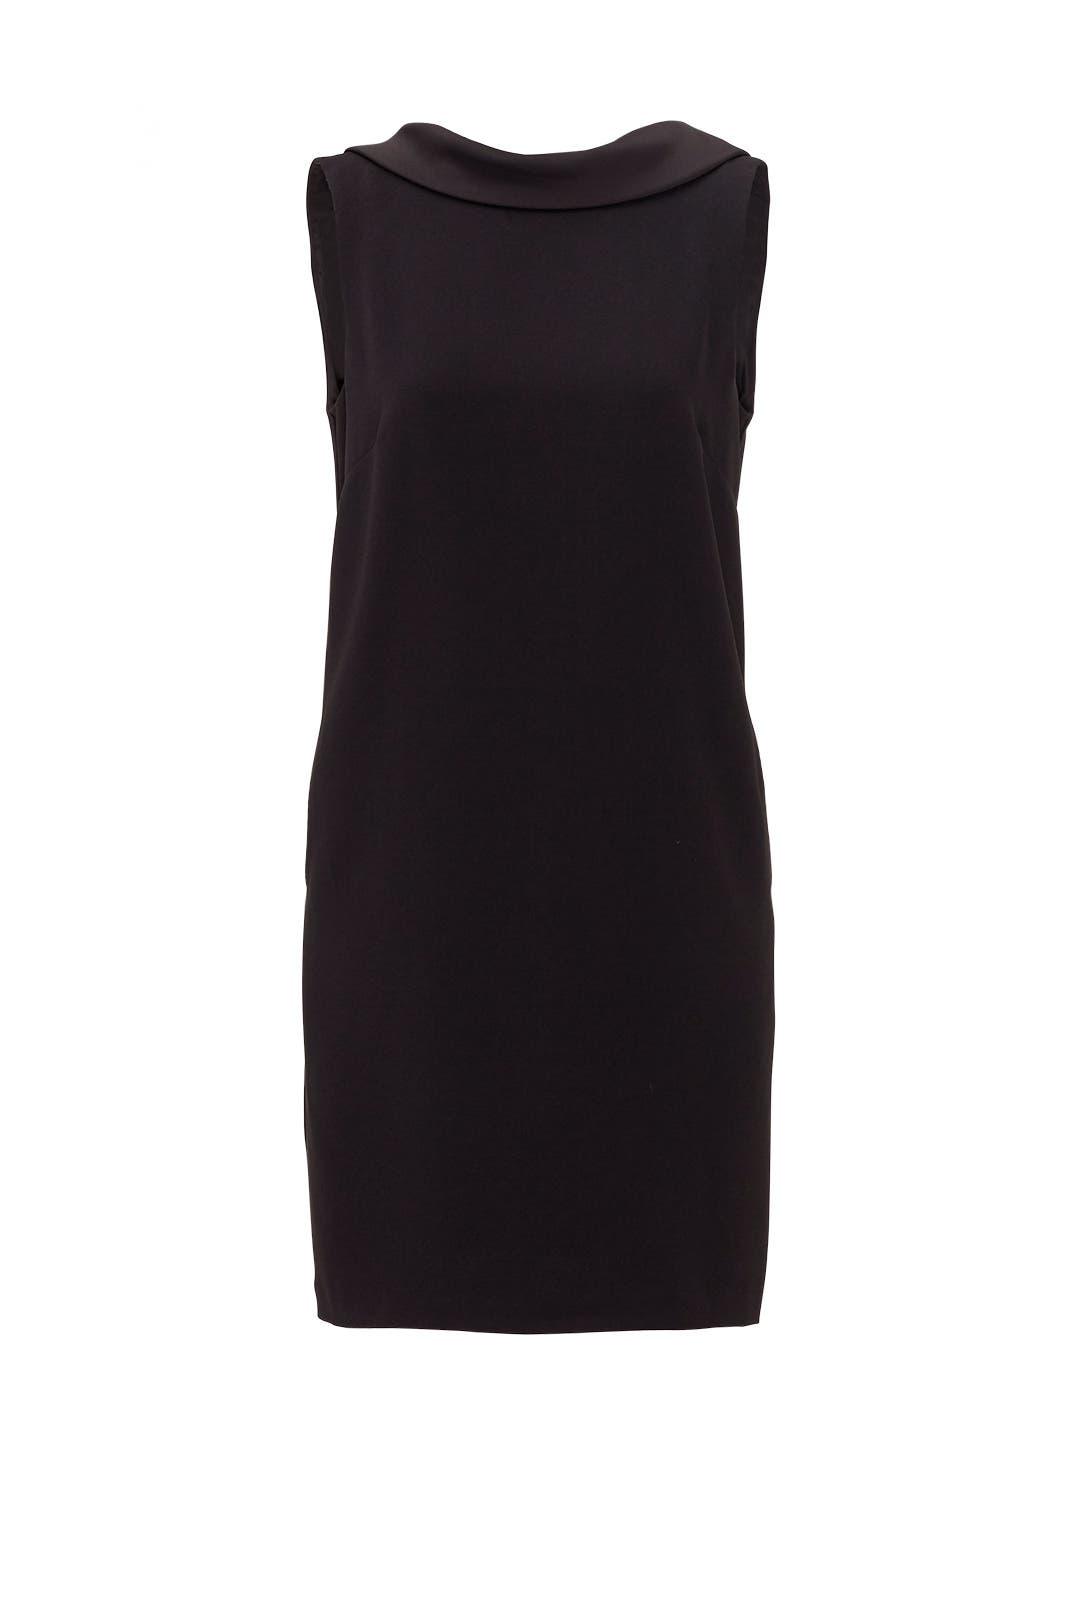 Black Nika Shift Dress by Trina Turk for $30 - $70 - Rent the Runway